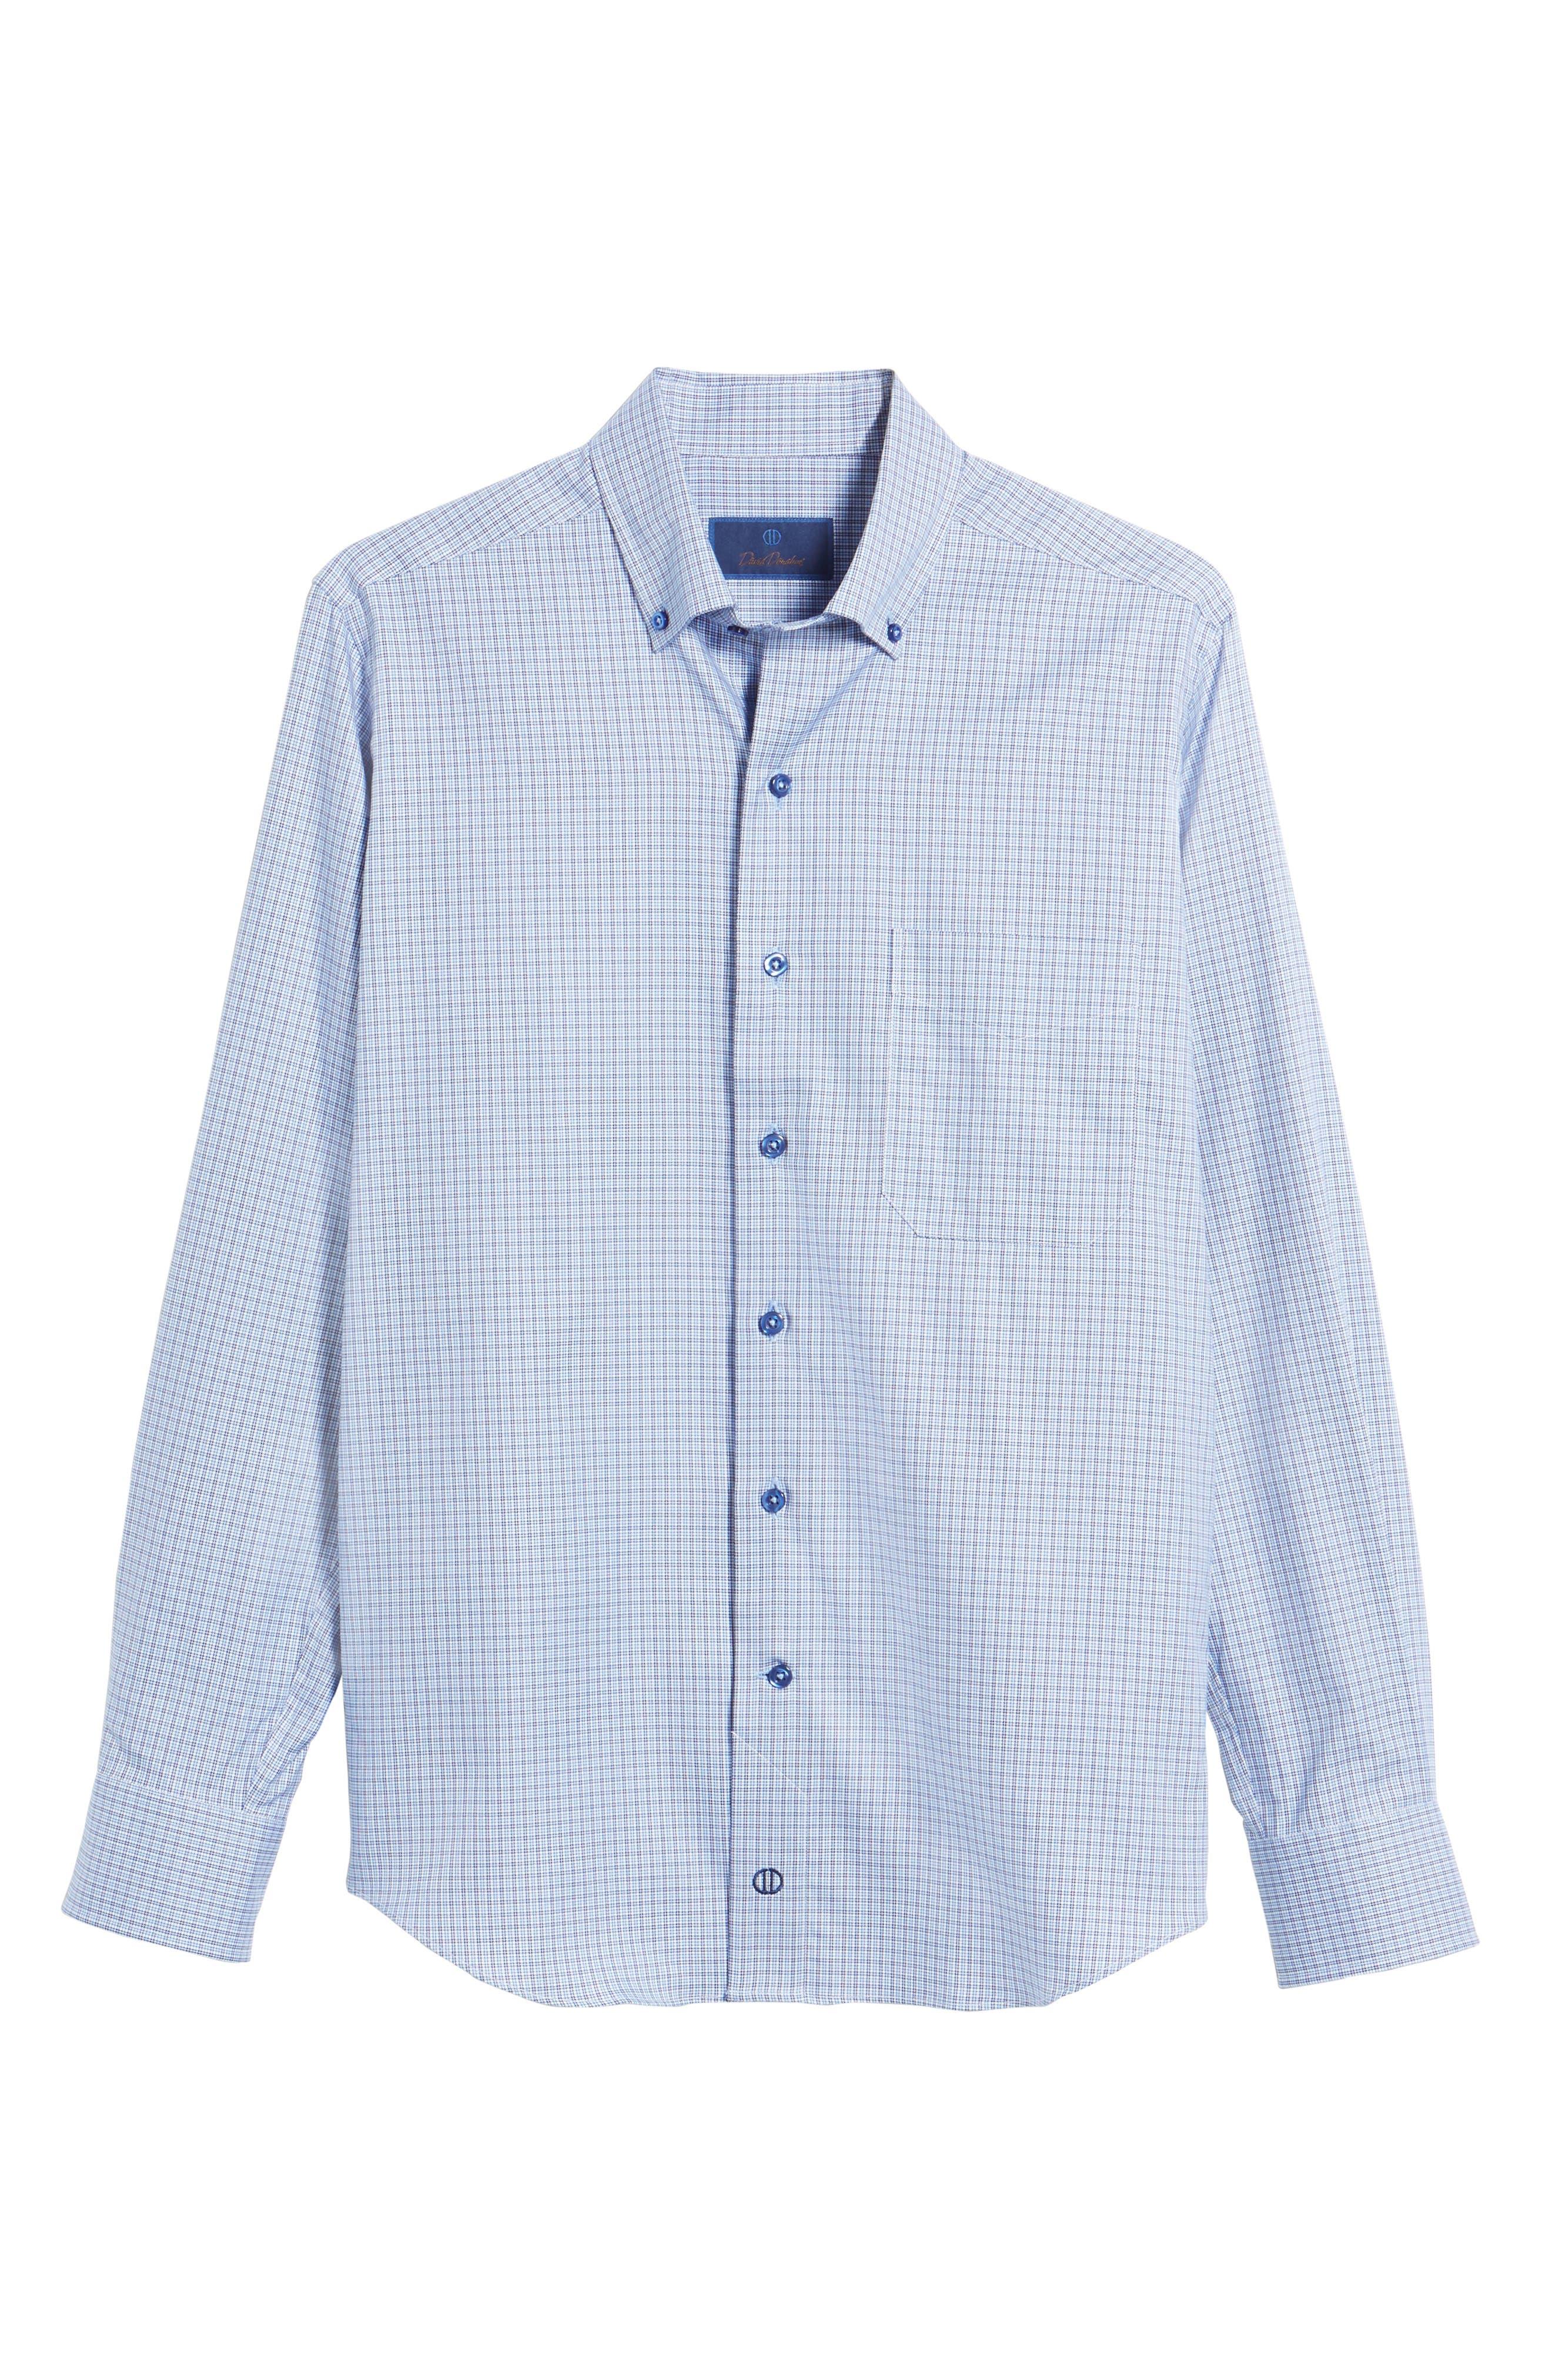 Regular Fit Plaid Sport Shirt,                             Alternate thumbnail 6, color,                             Navy/ Sky